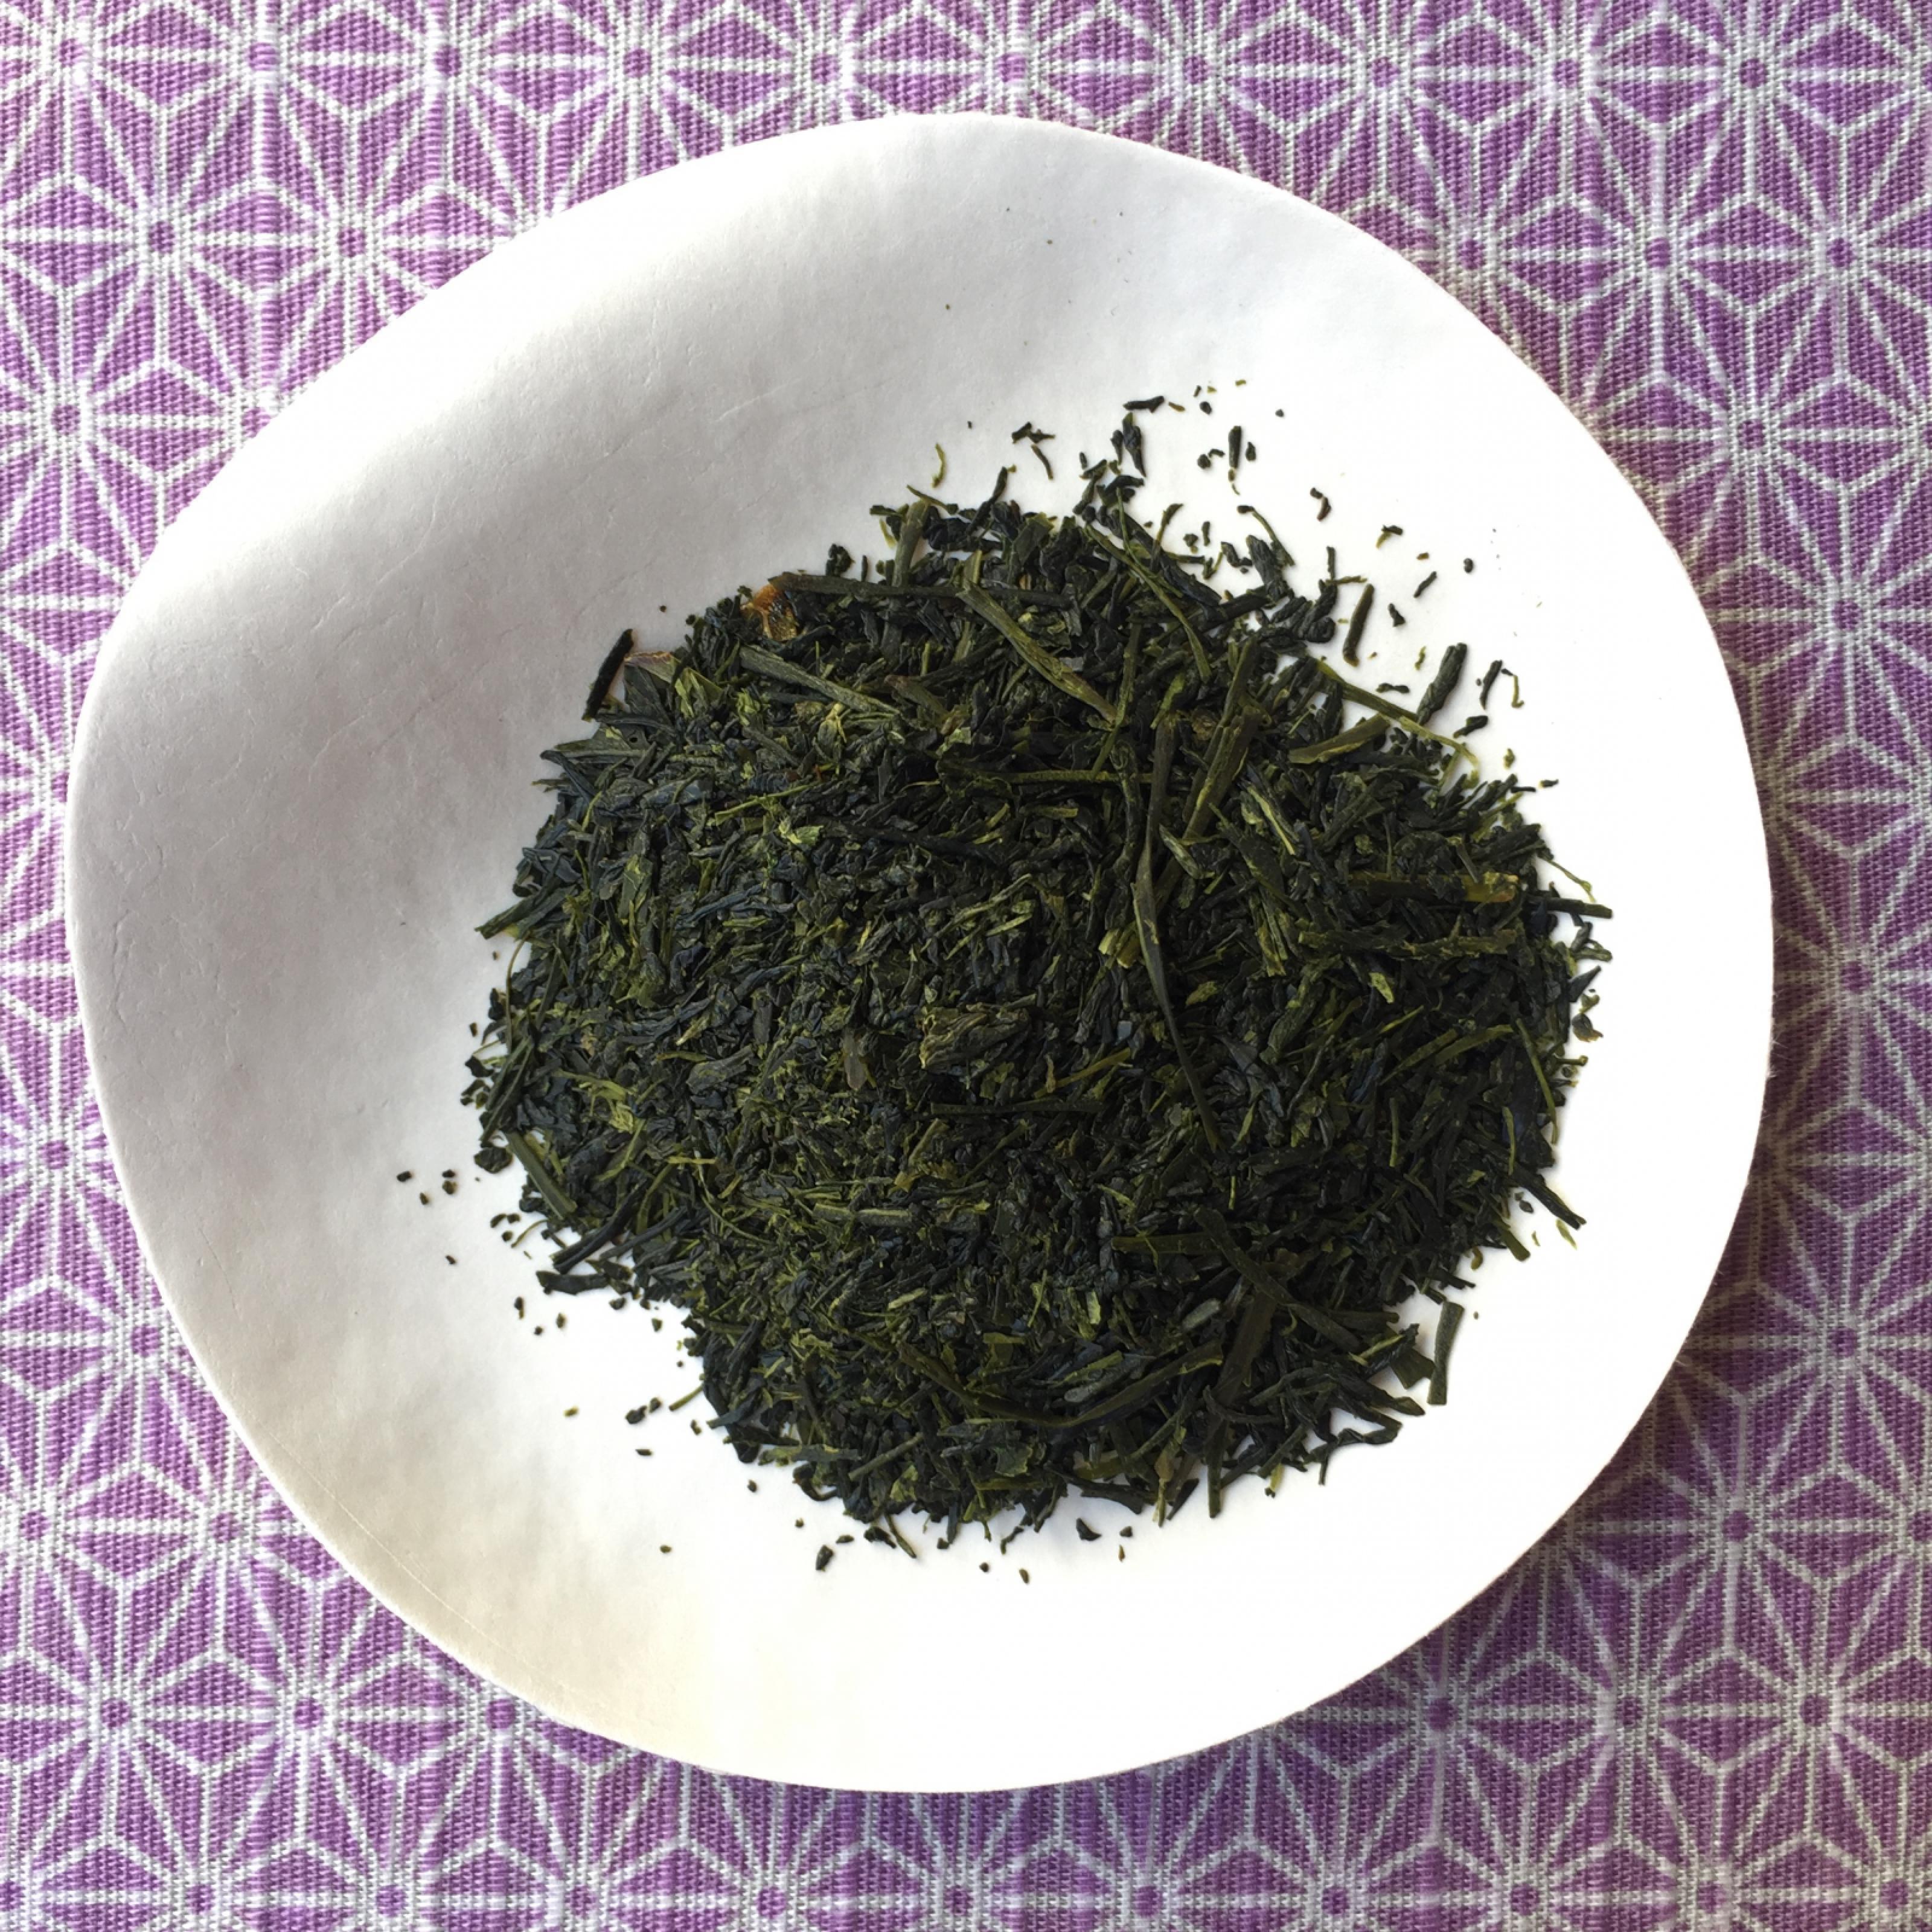 Fukamushicha Bio de Chiran - sencha - thé vert japonais - Nihoncha Paris